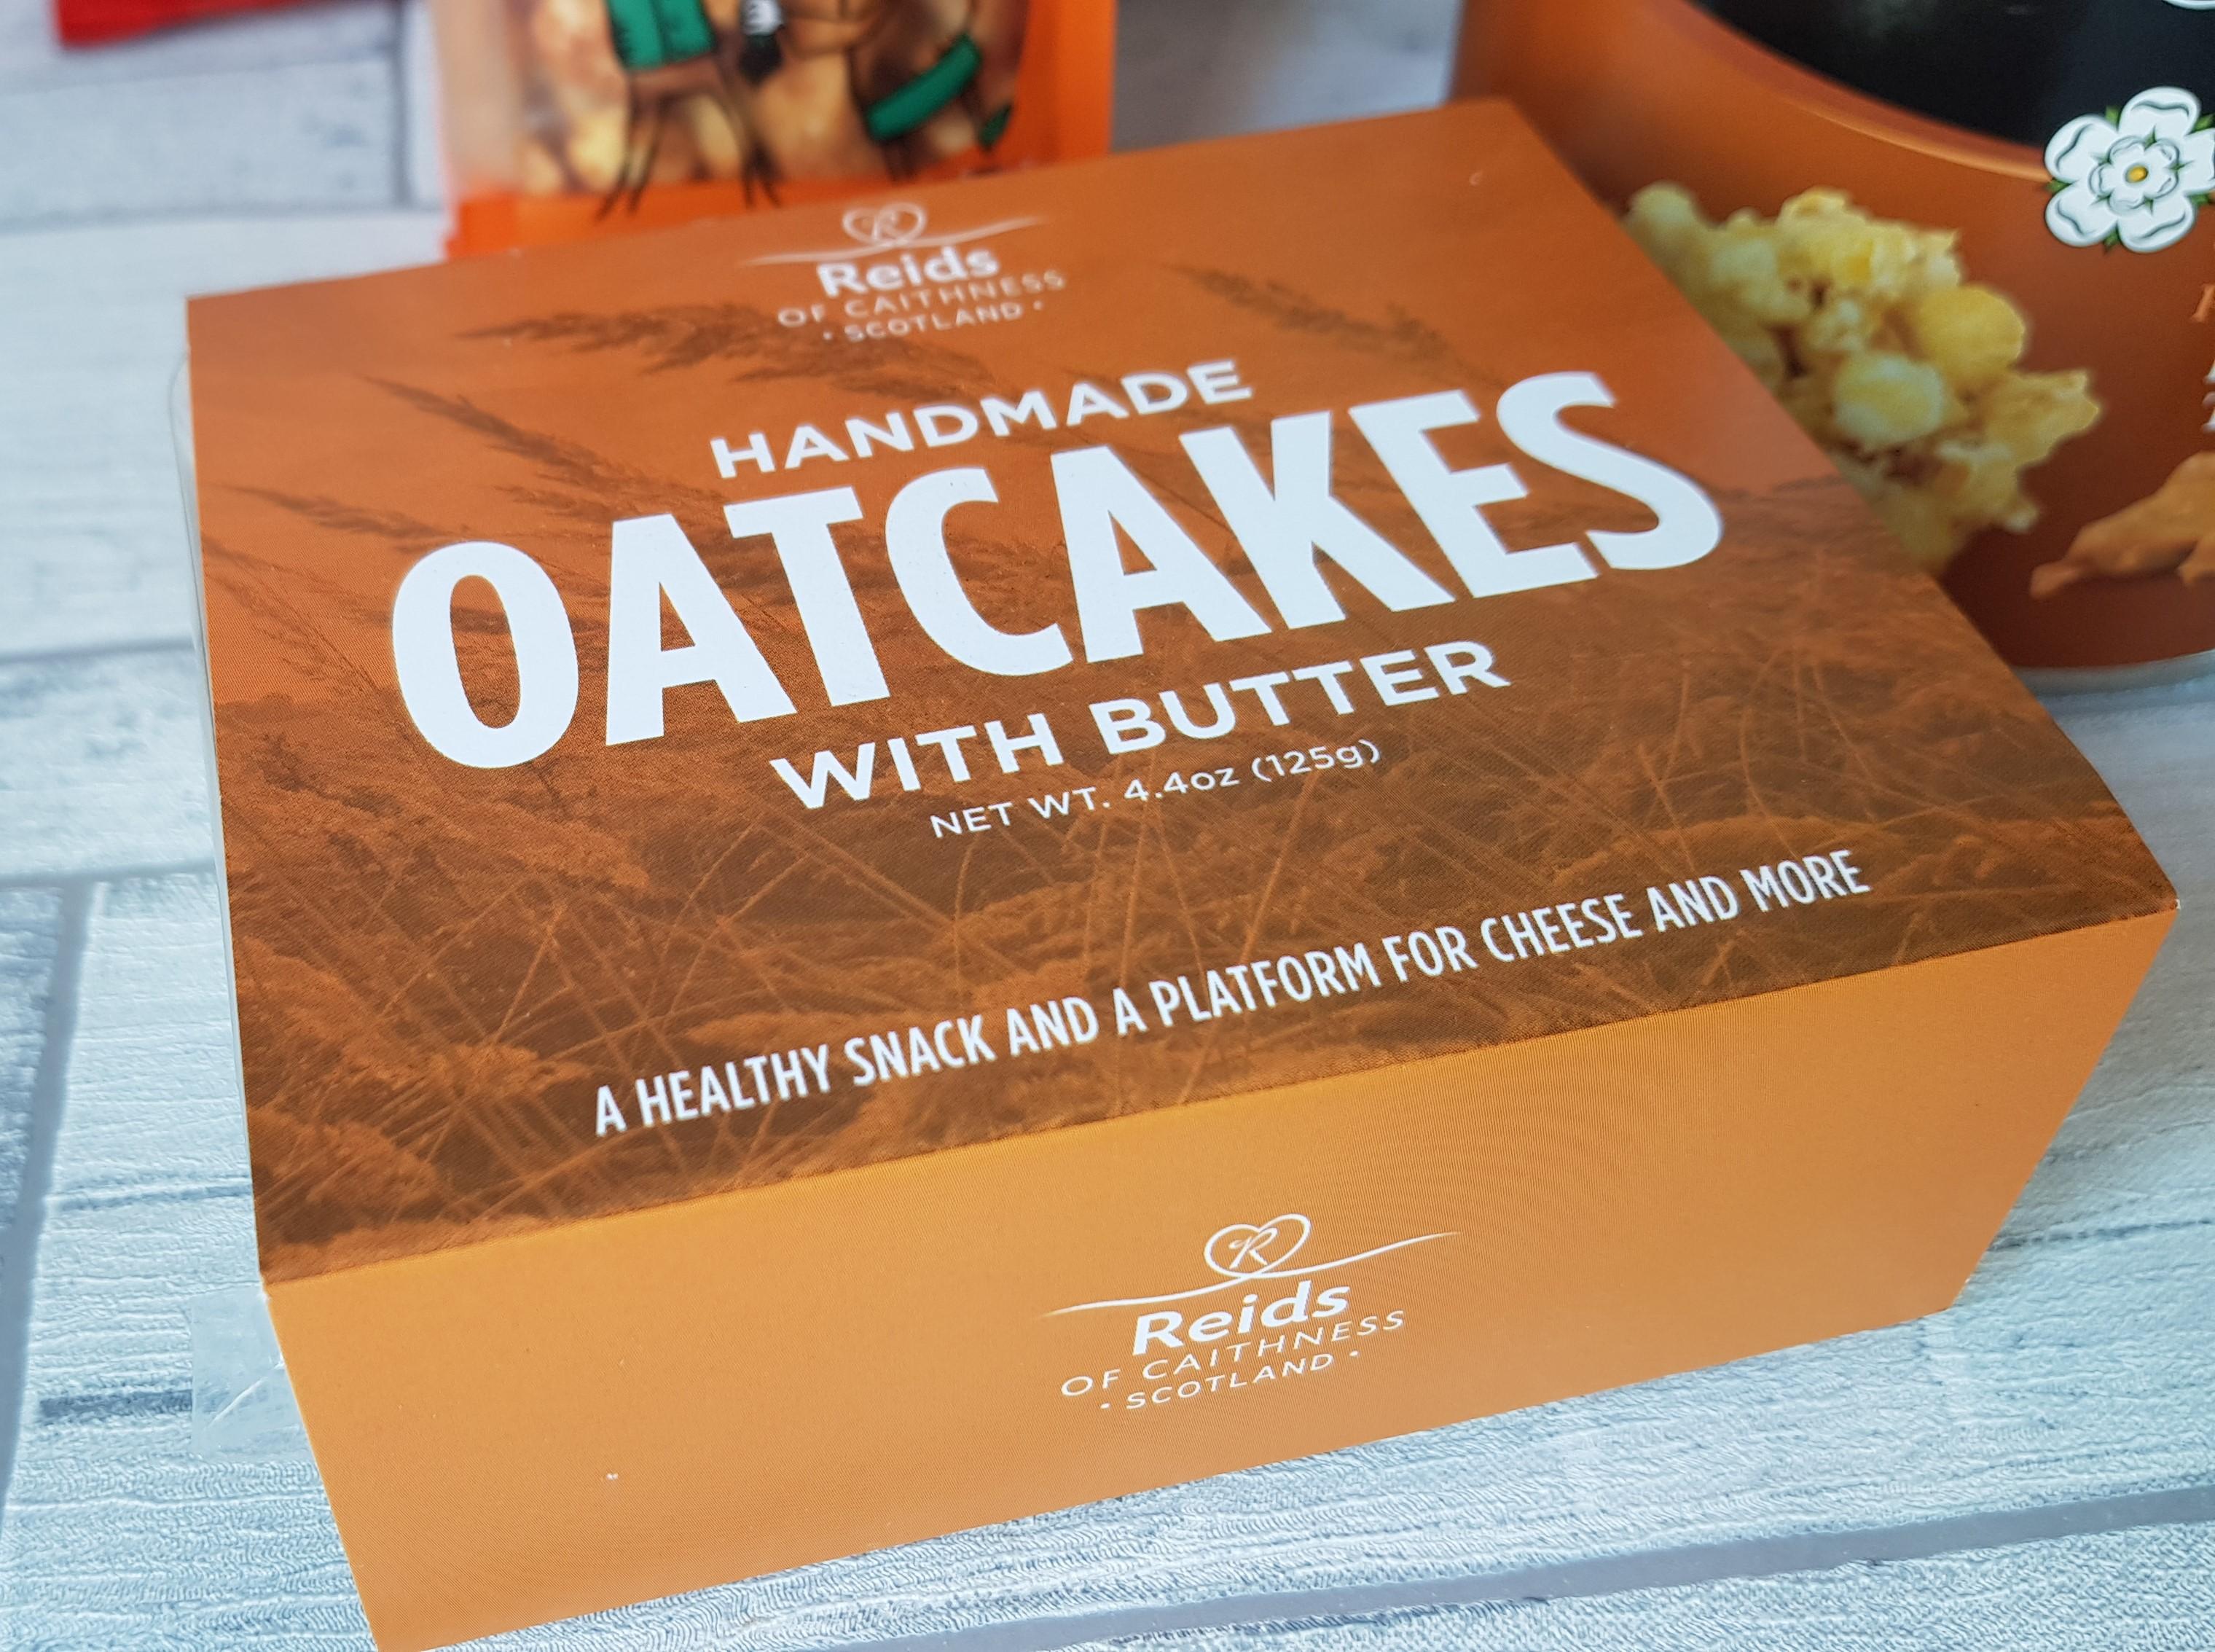 Prestige Hampers oatcakes